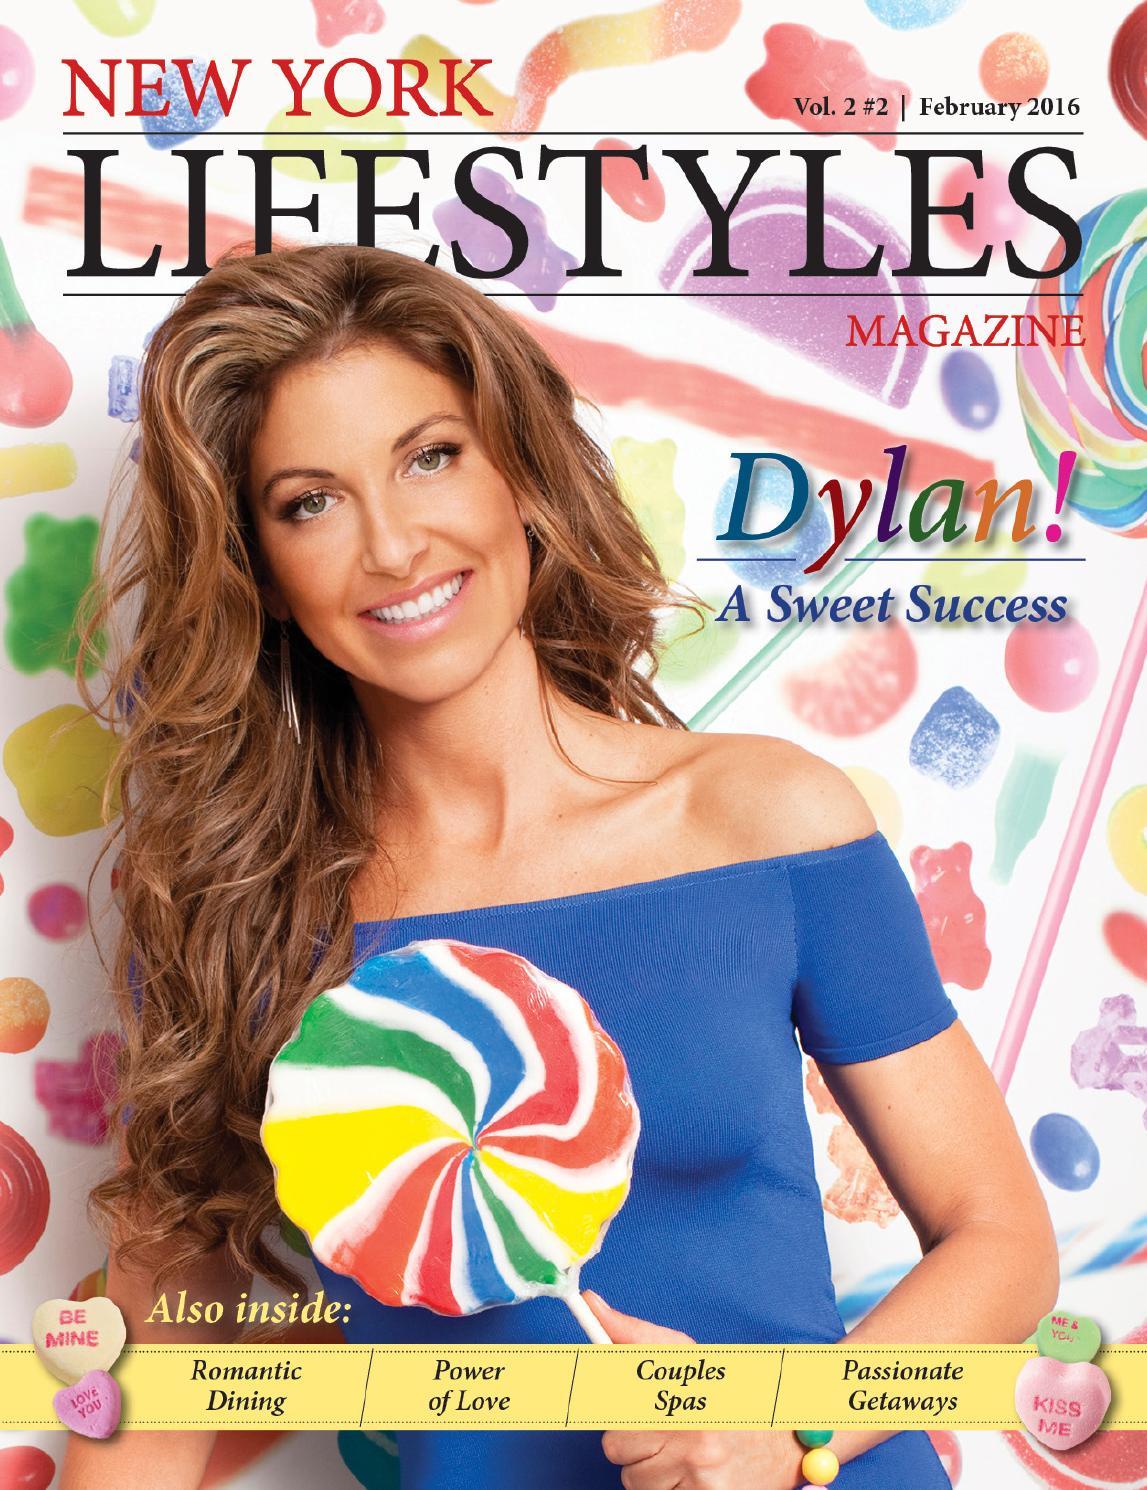 a0b33df583f New York Lifestyles Magazine - February 2016 by New York Lifestyles  Magazine - issuu